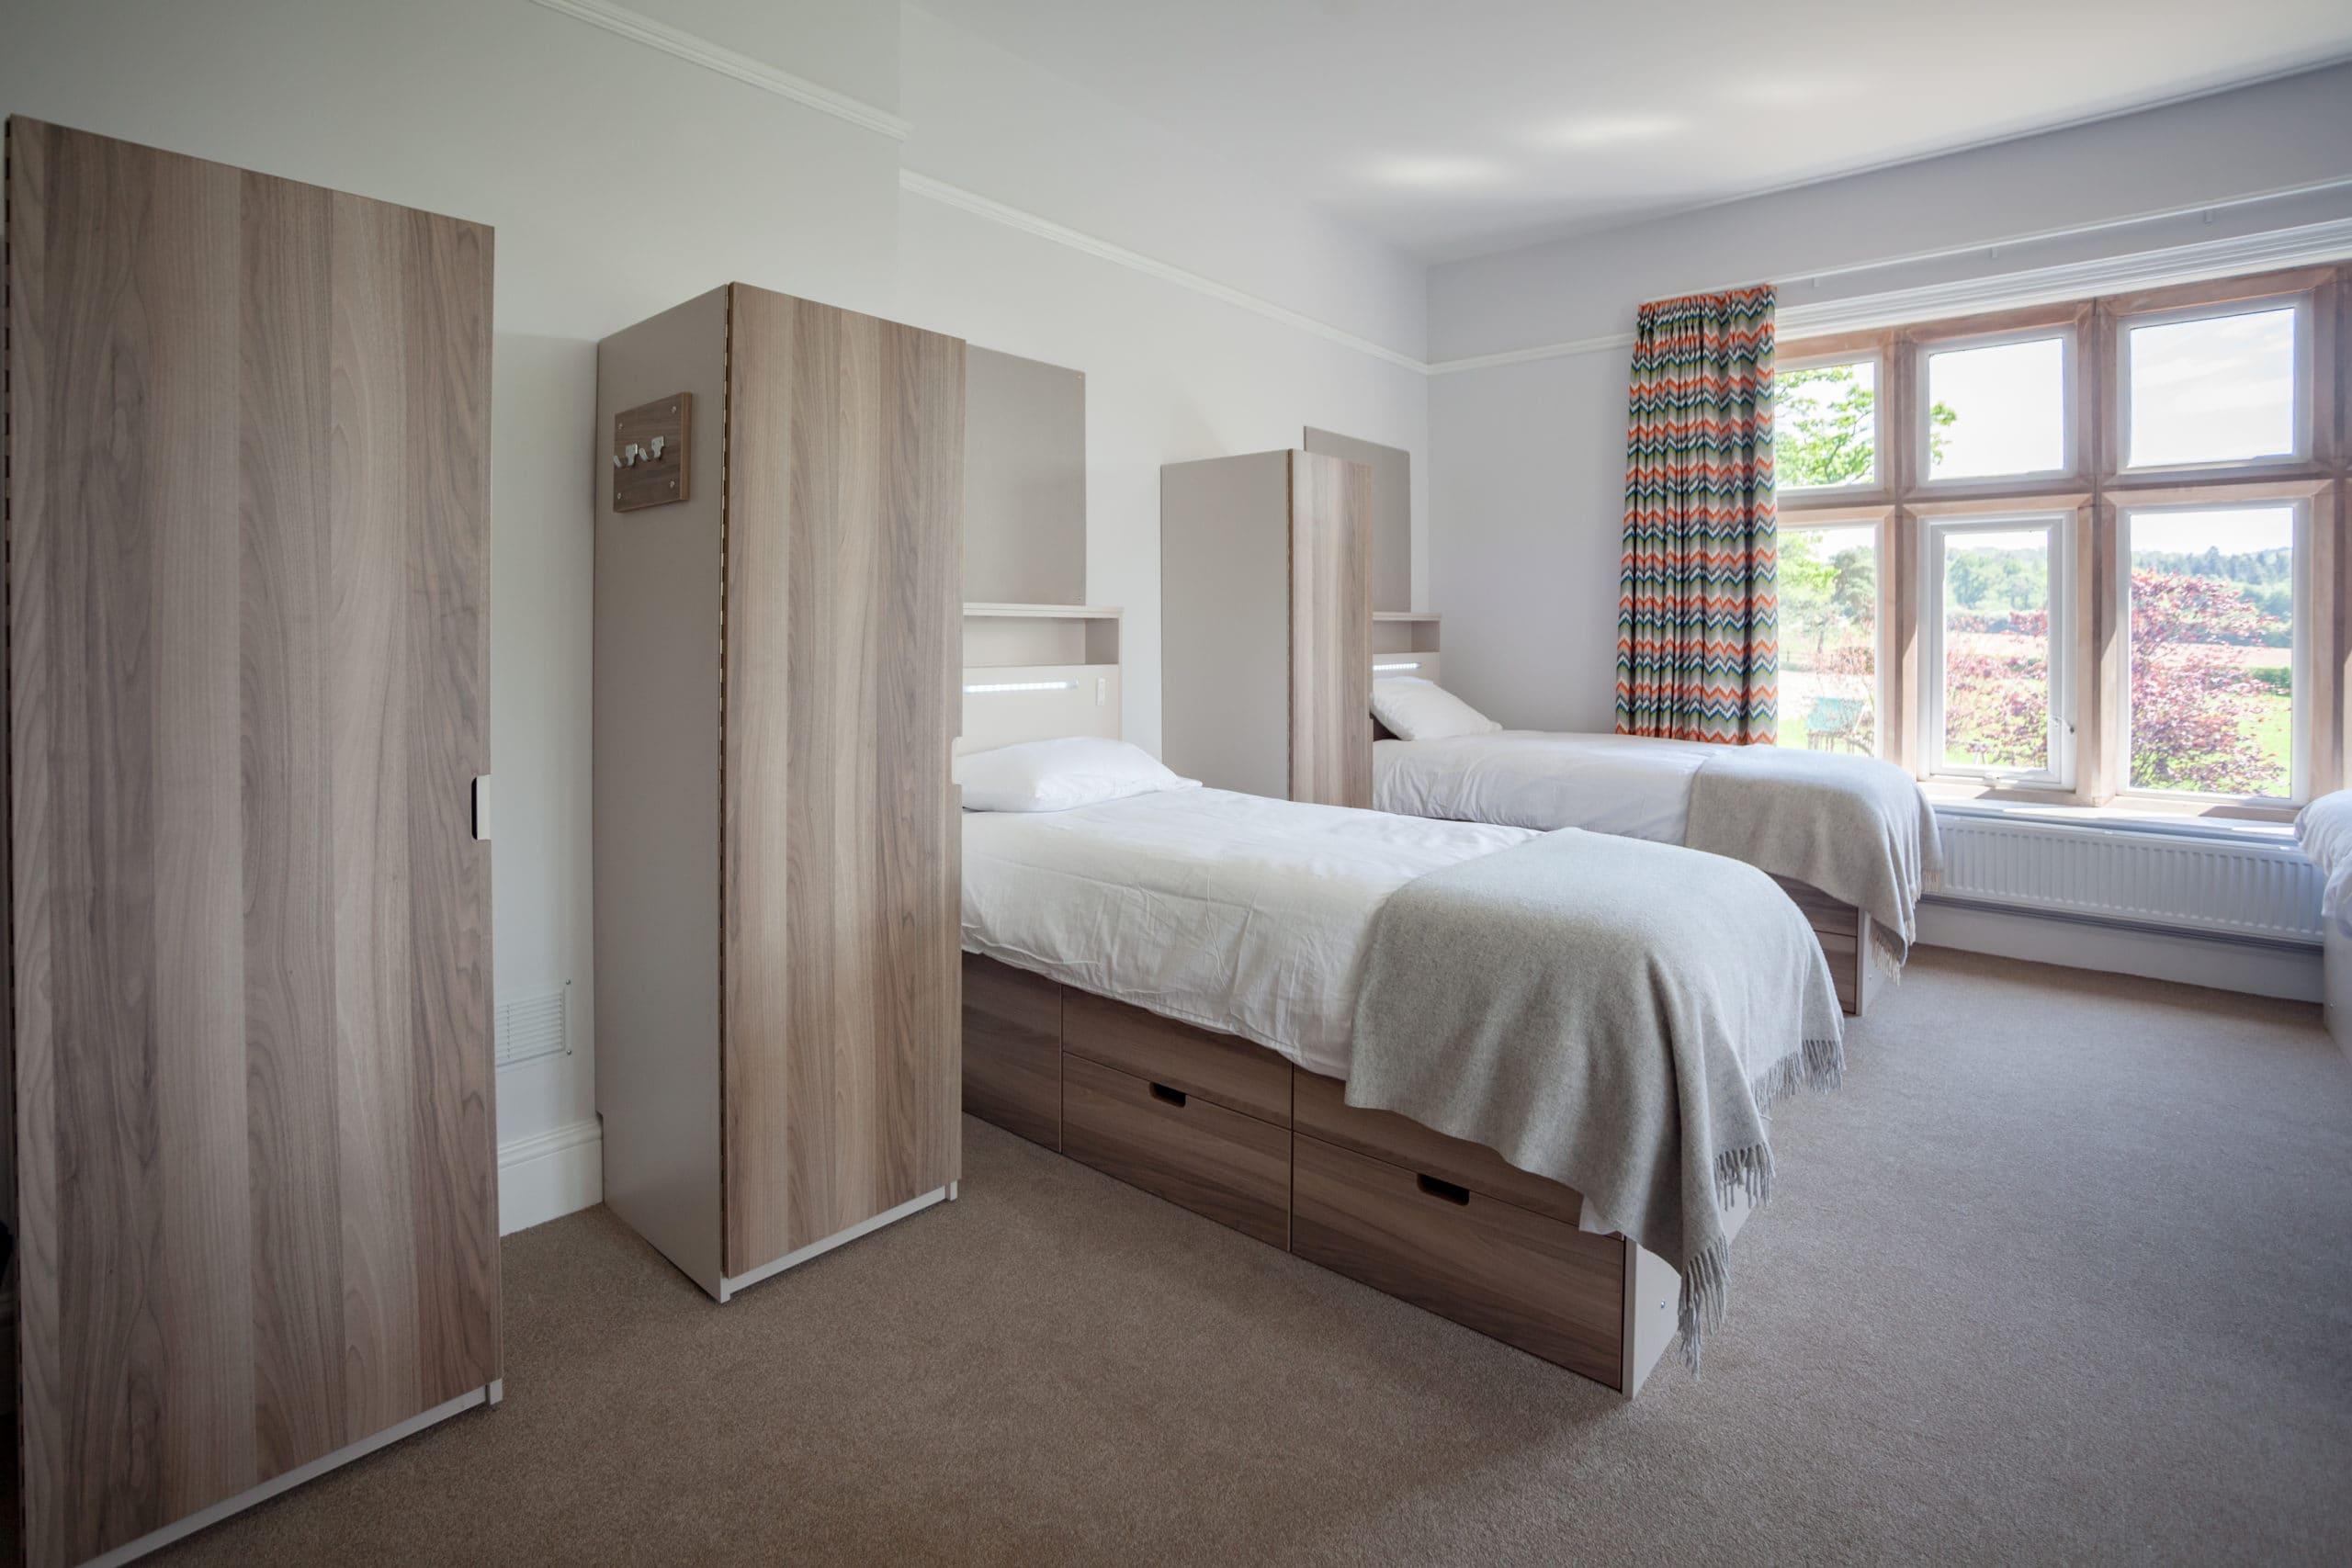 Hereford Cathedral School dormroom accomodation furniture